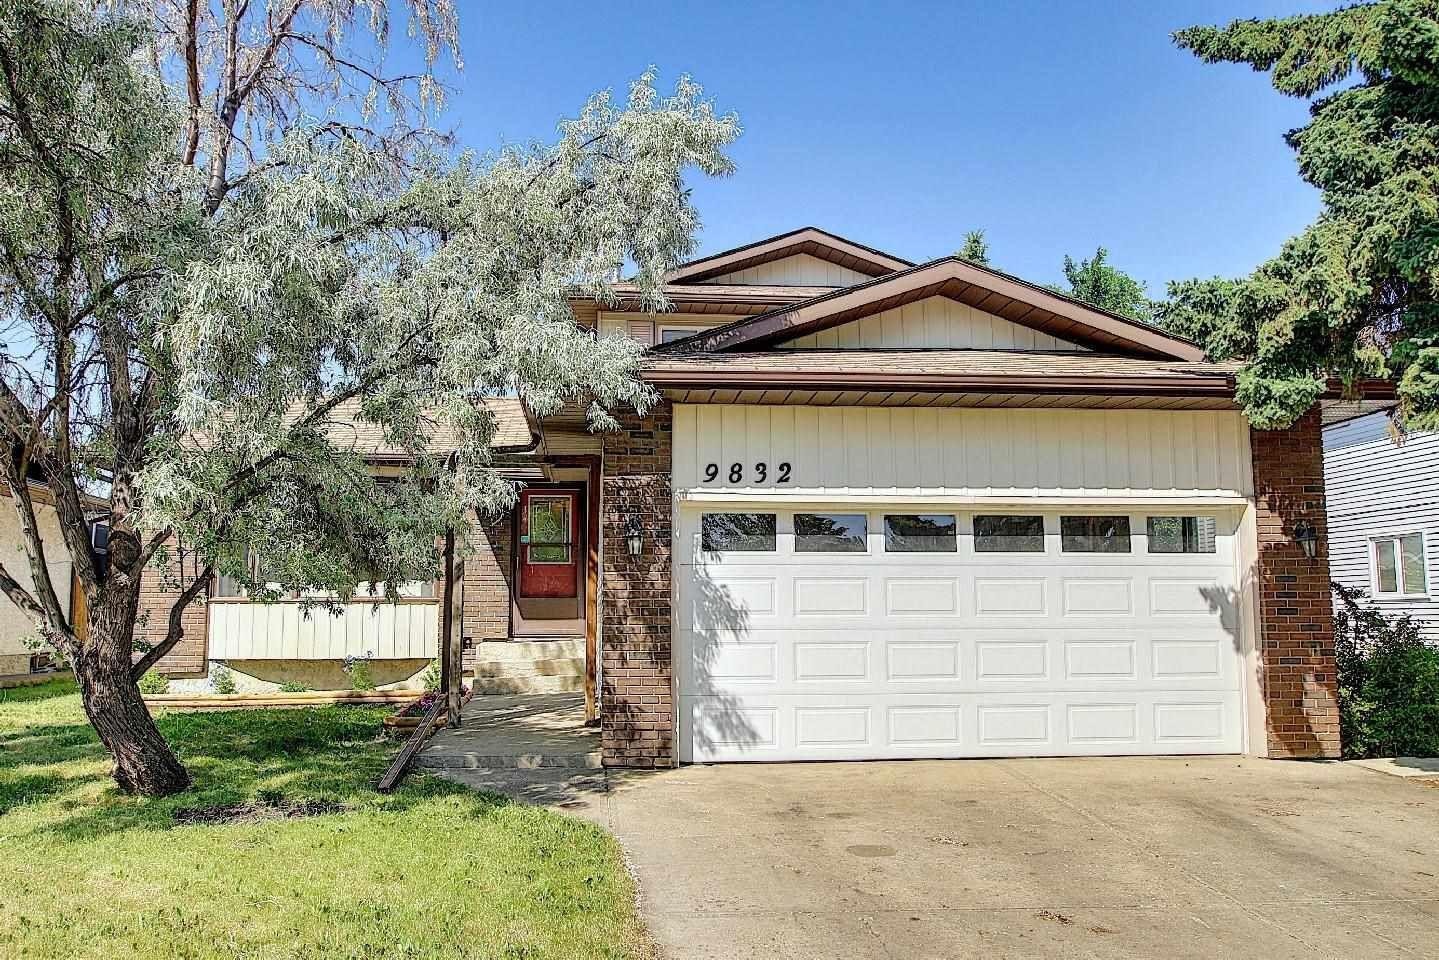 Main Photo: 9832 187 Street in Edmonton: Zone 20 House for sale : MLS®# E4253744